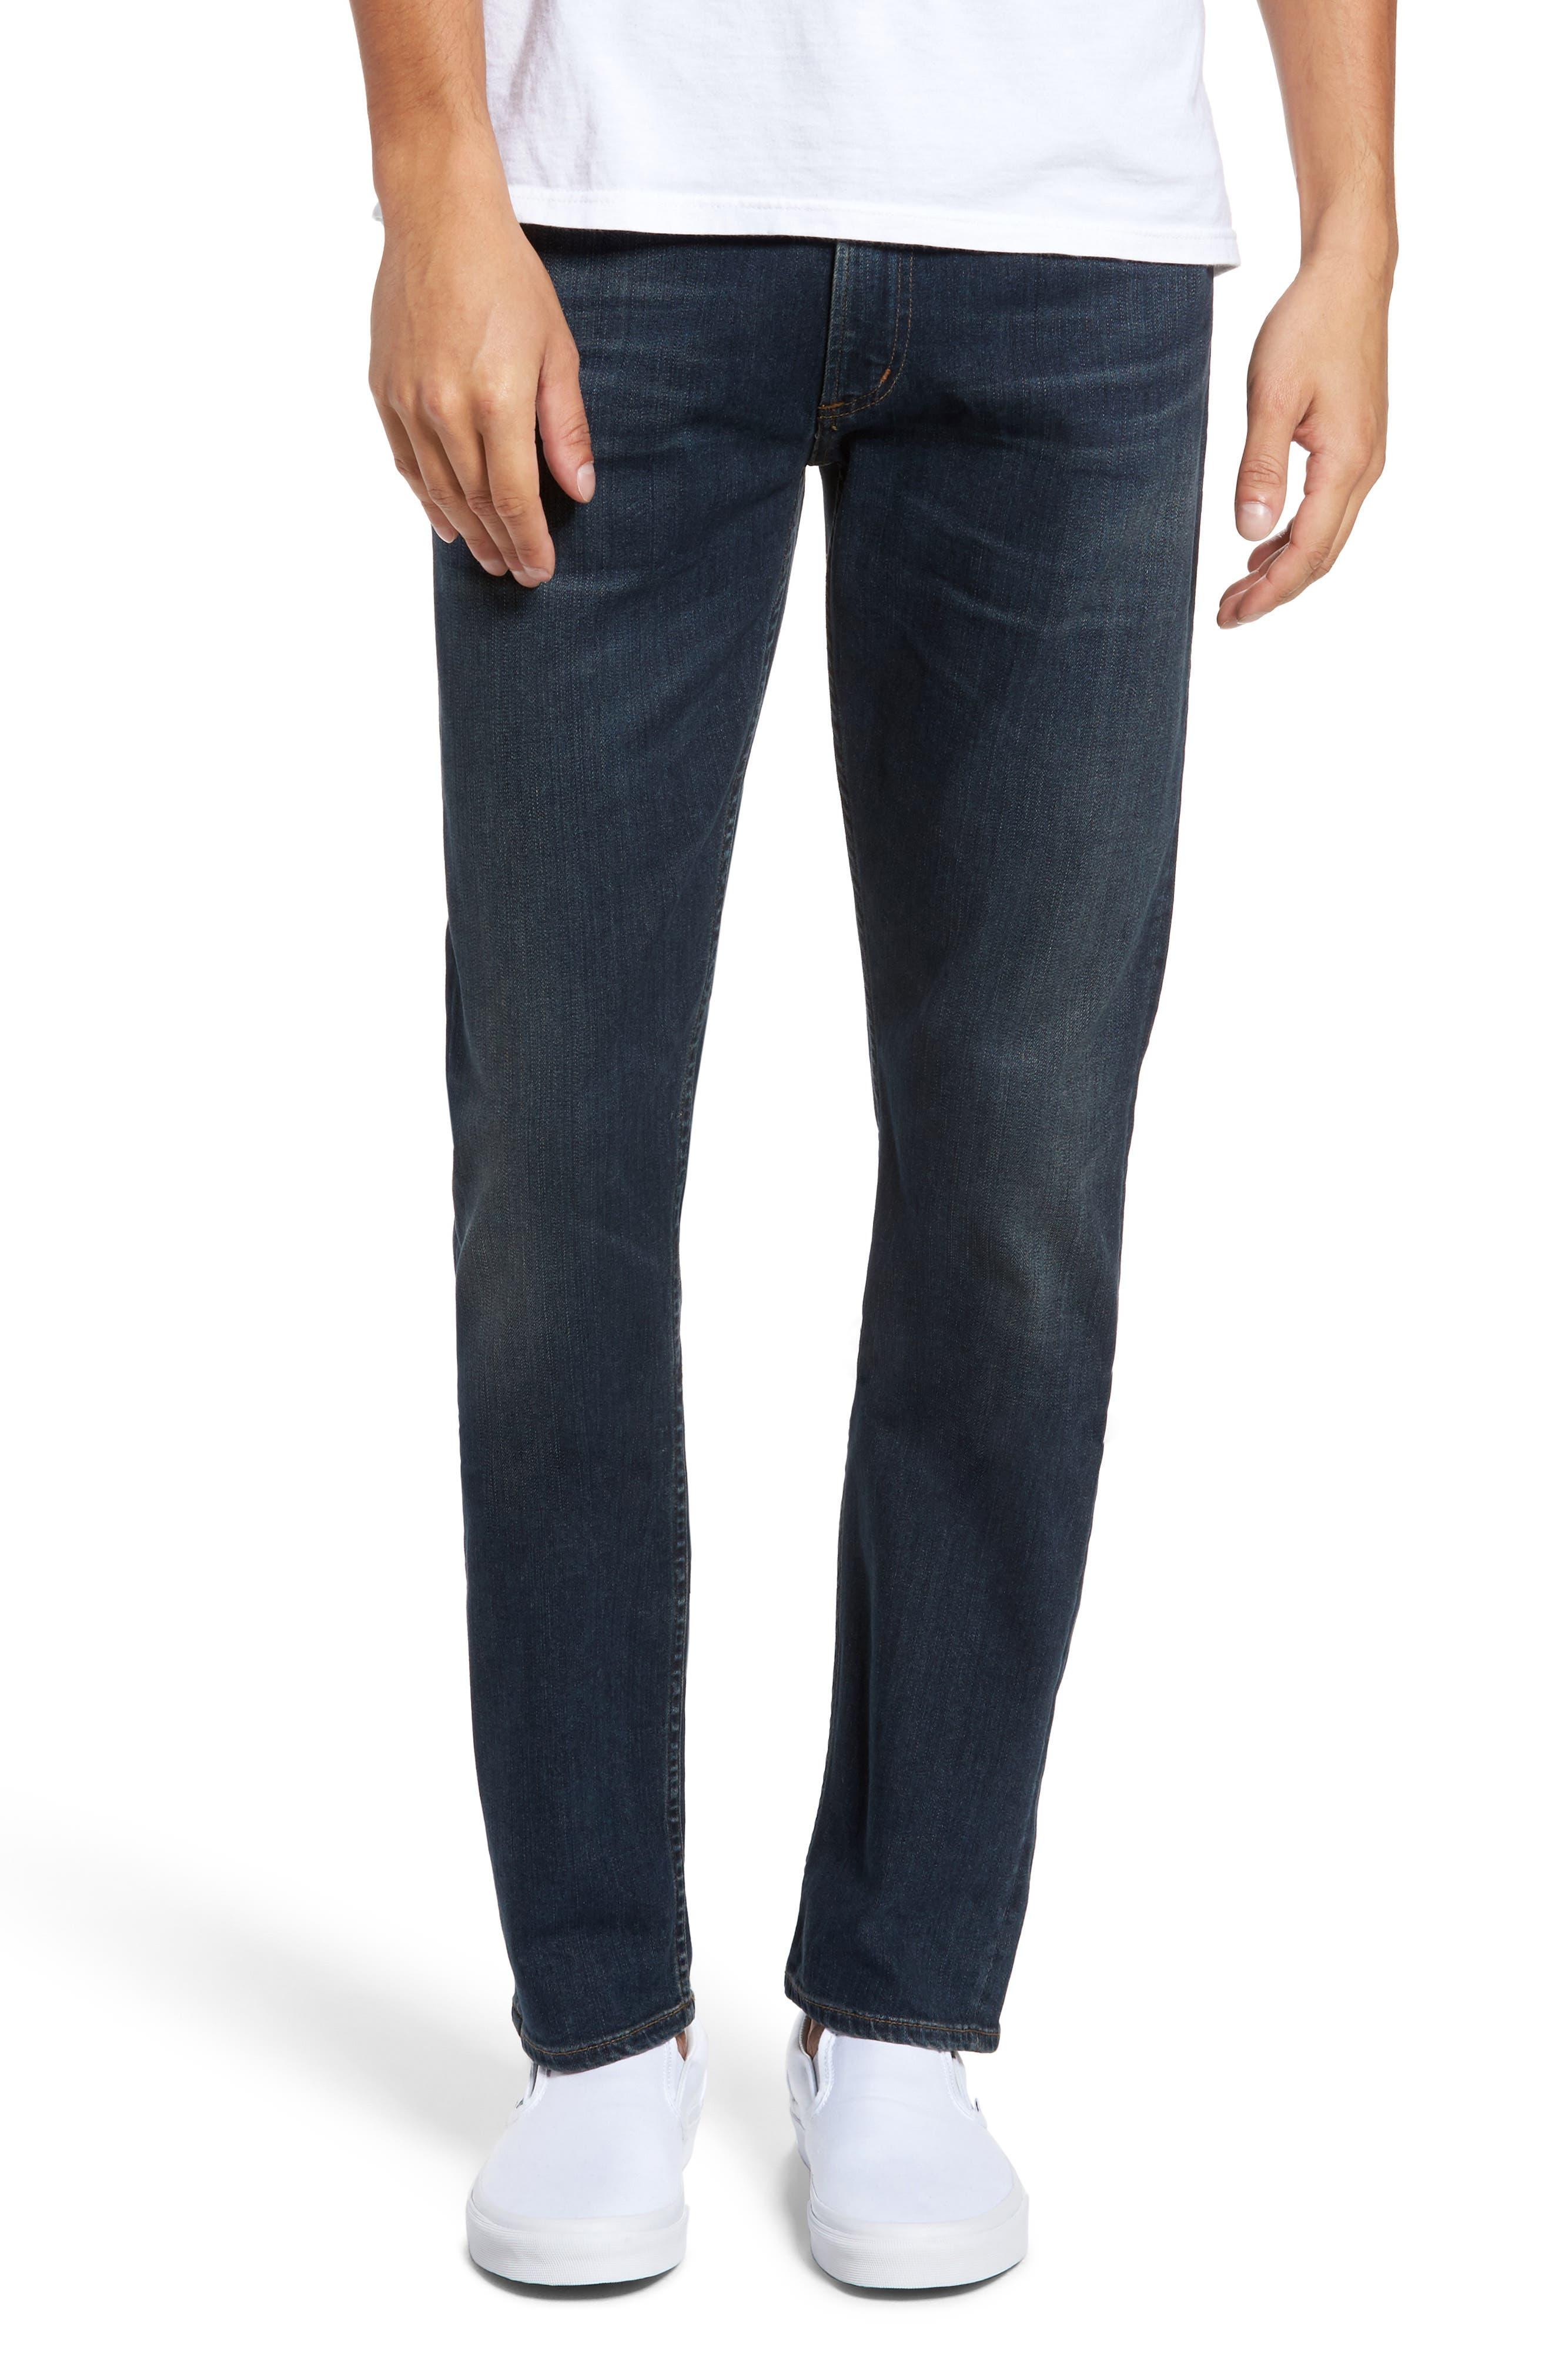 PERFORM - Bowery Slim Fit Jeans,                             Main thumbnail 1, color,                             Kingman